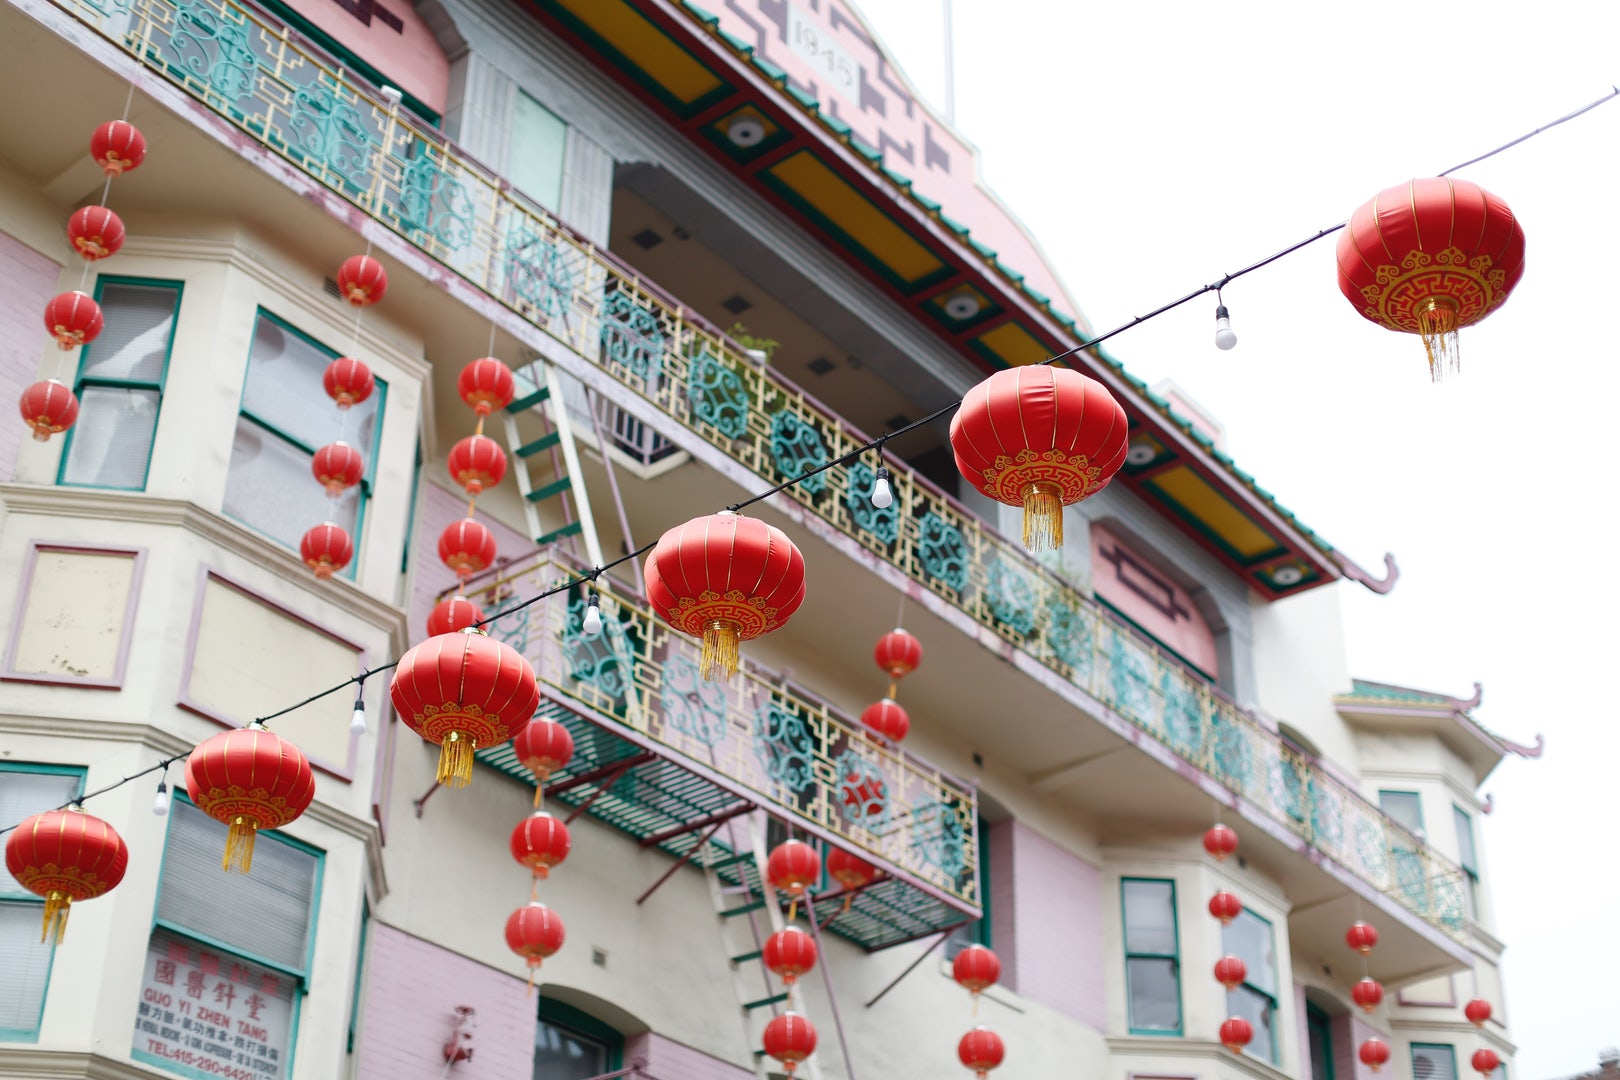 Chinese lanterns in San Francisco Chinatown